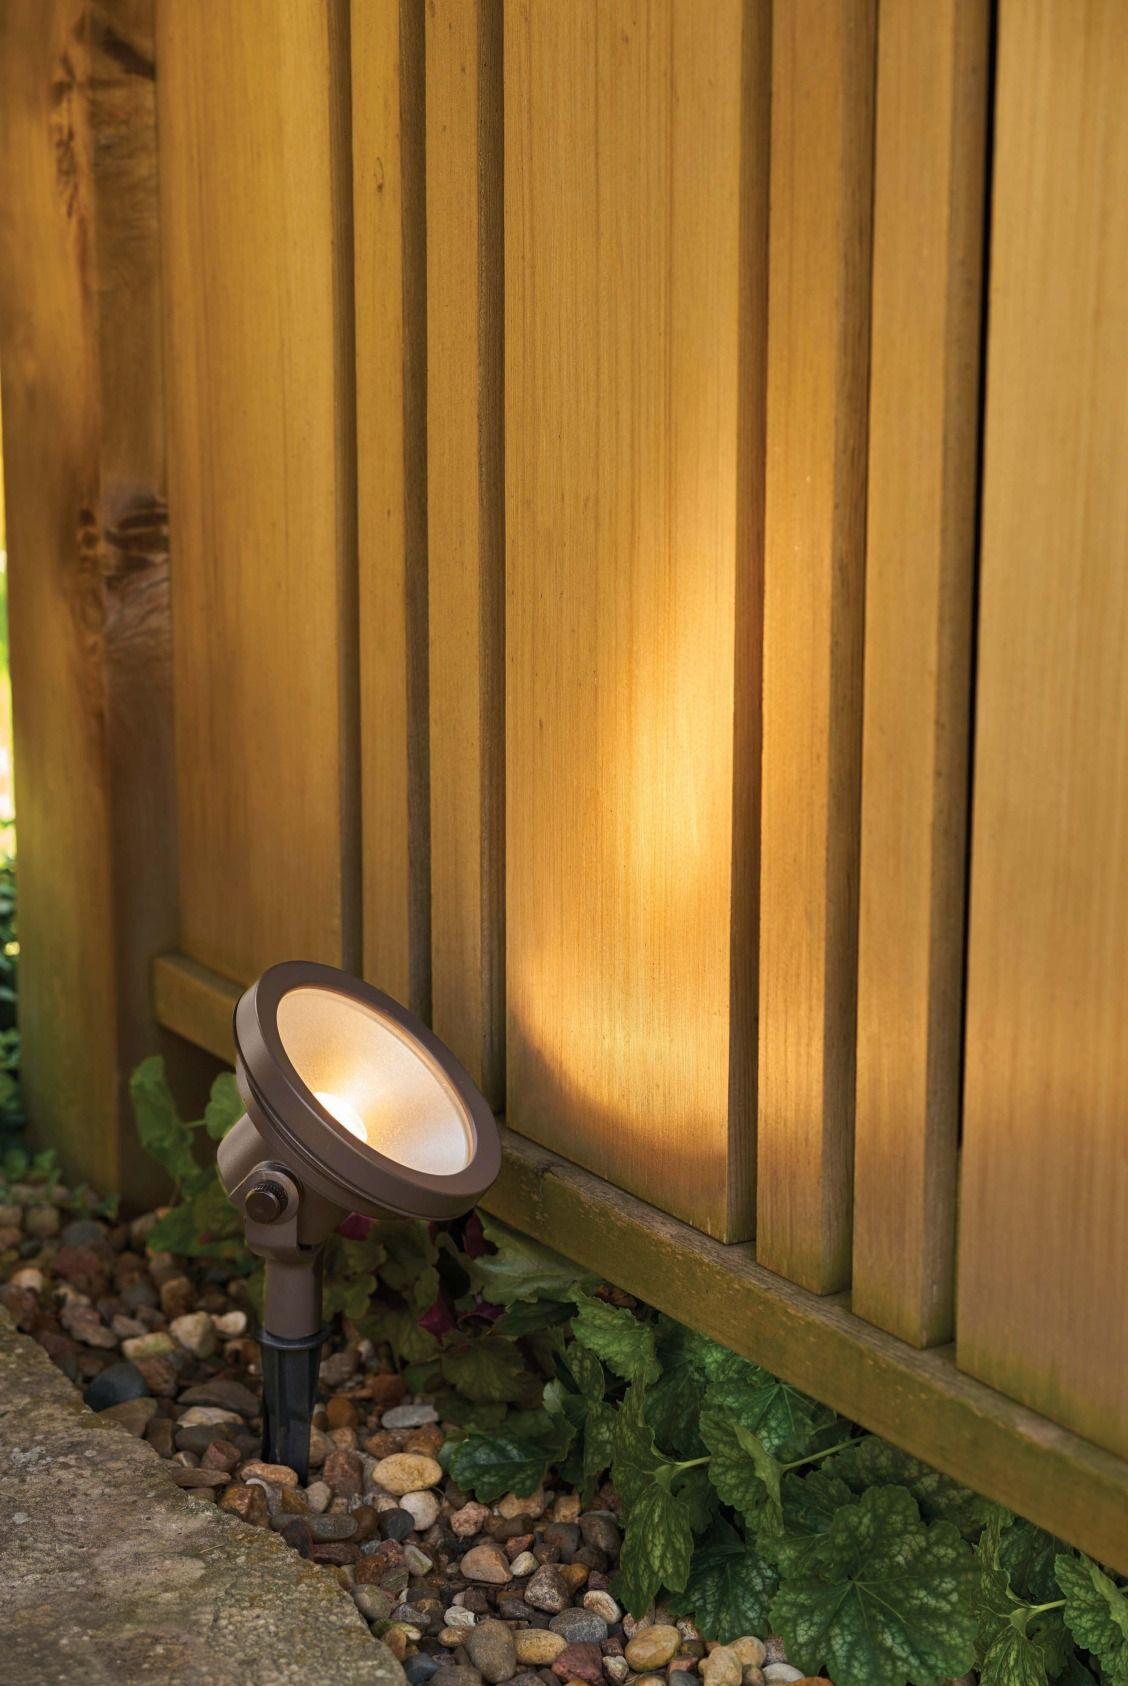 Patio Garden Wall Wash Lighting Home Garden Better Homes Gardens